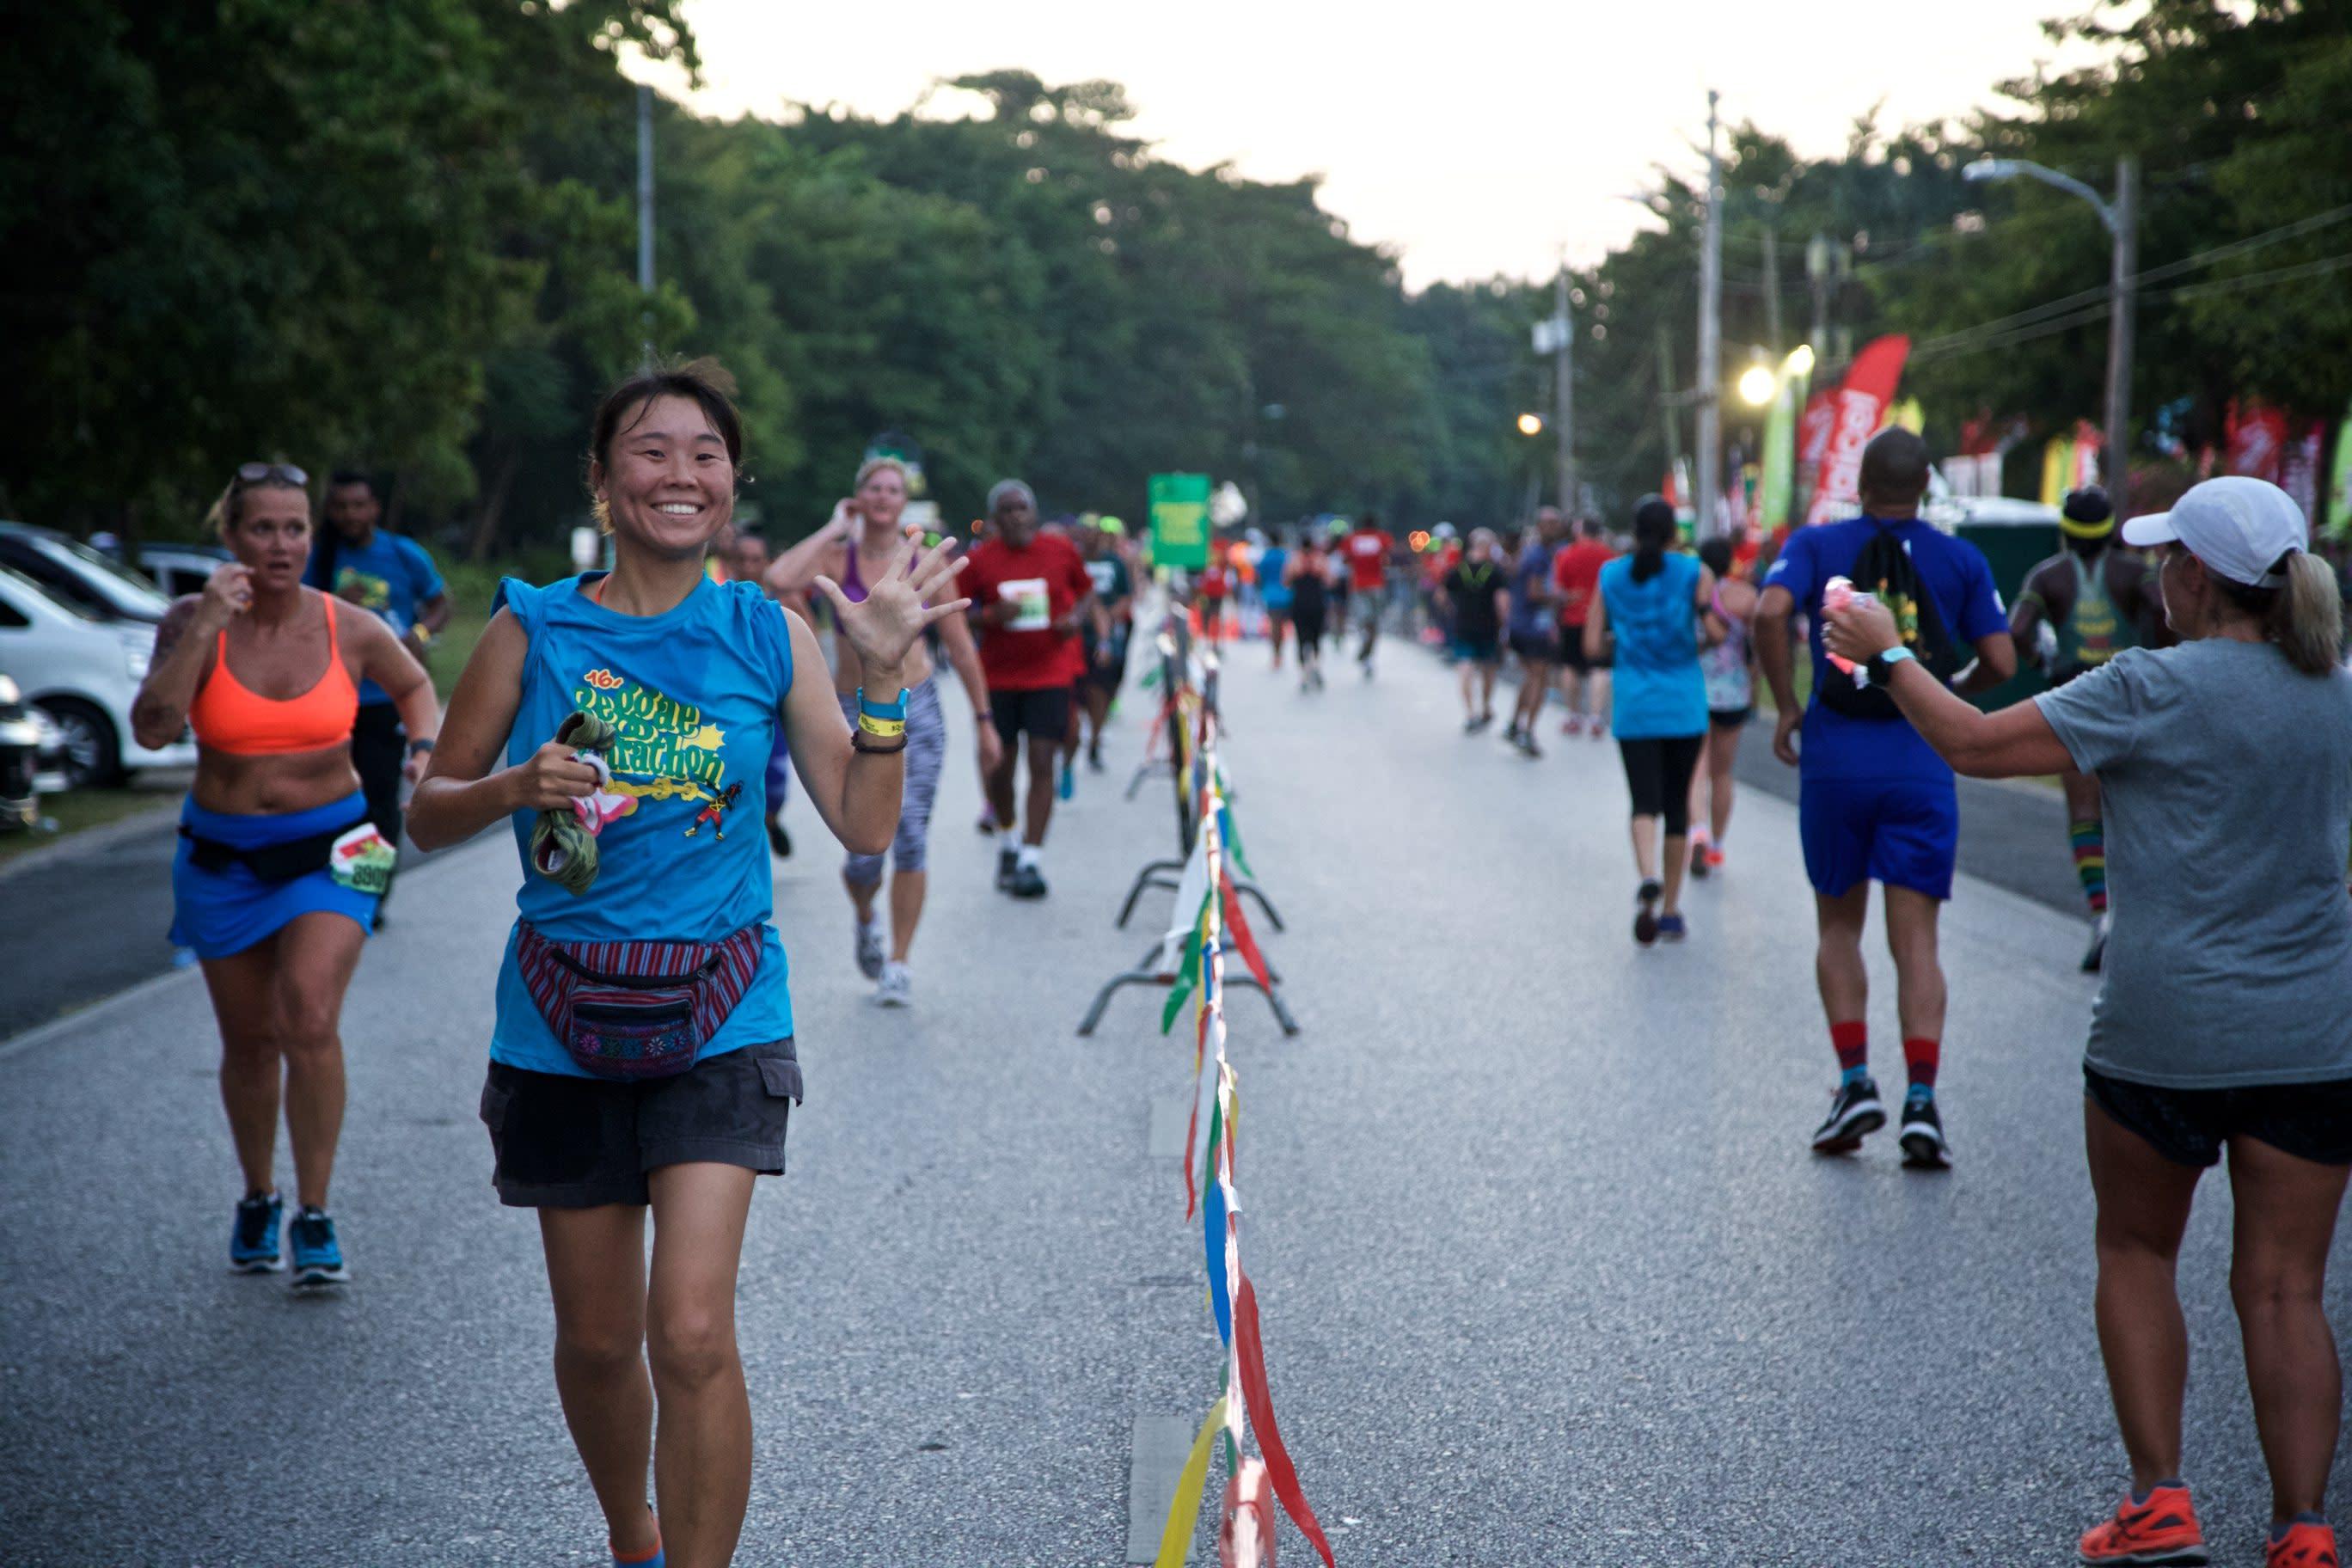 Participants on the run route of the 2016 Reggae Marathon in Negril, Jamaica.